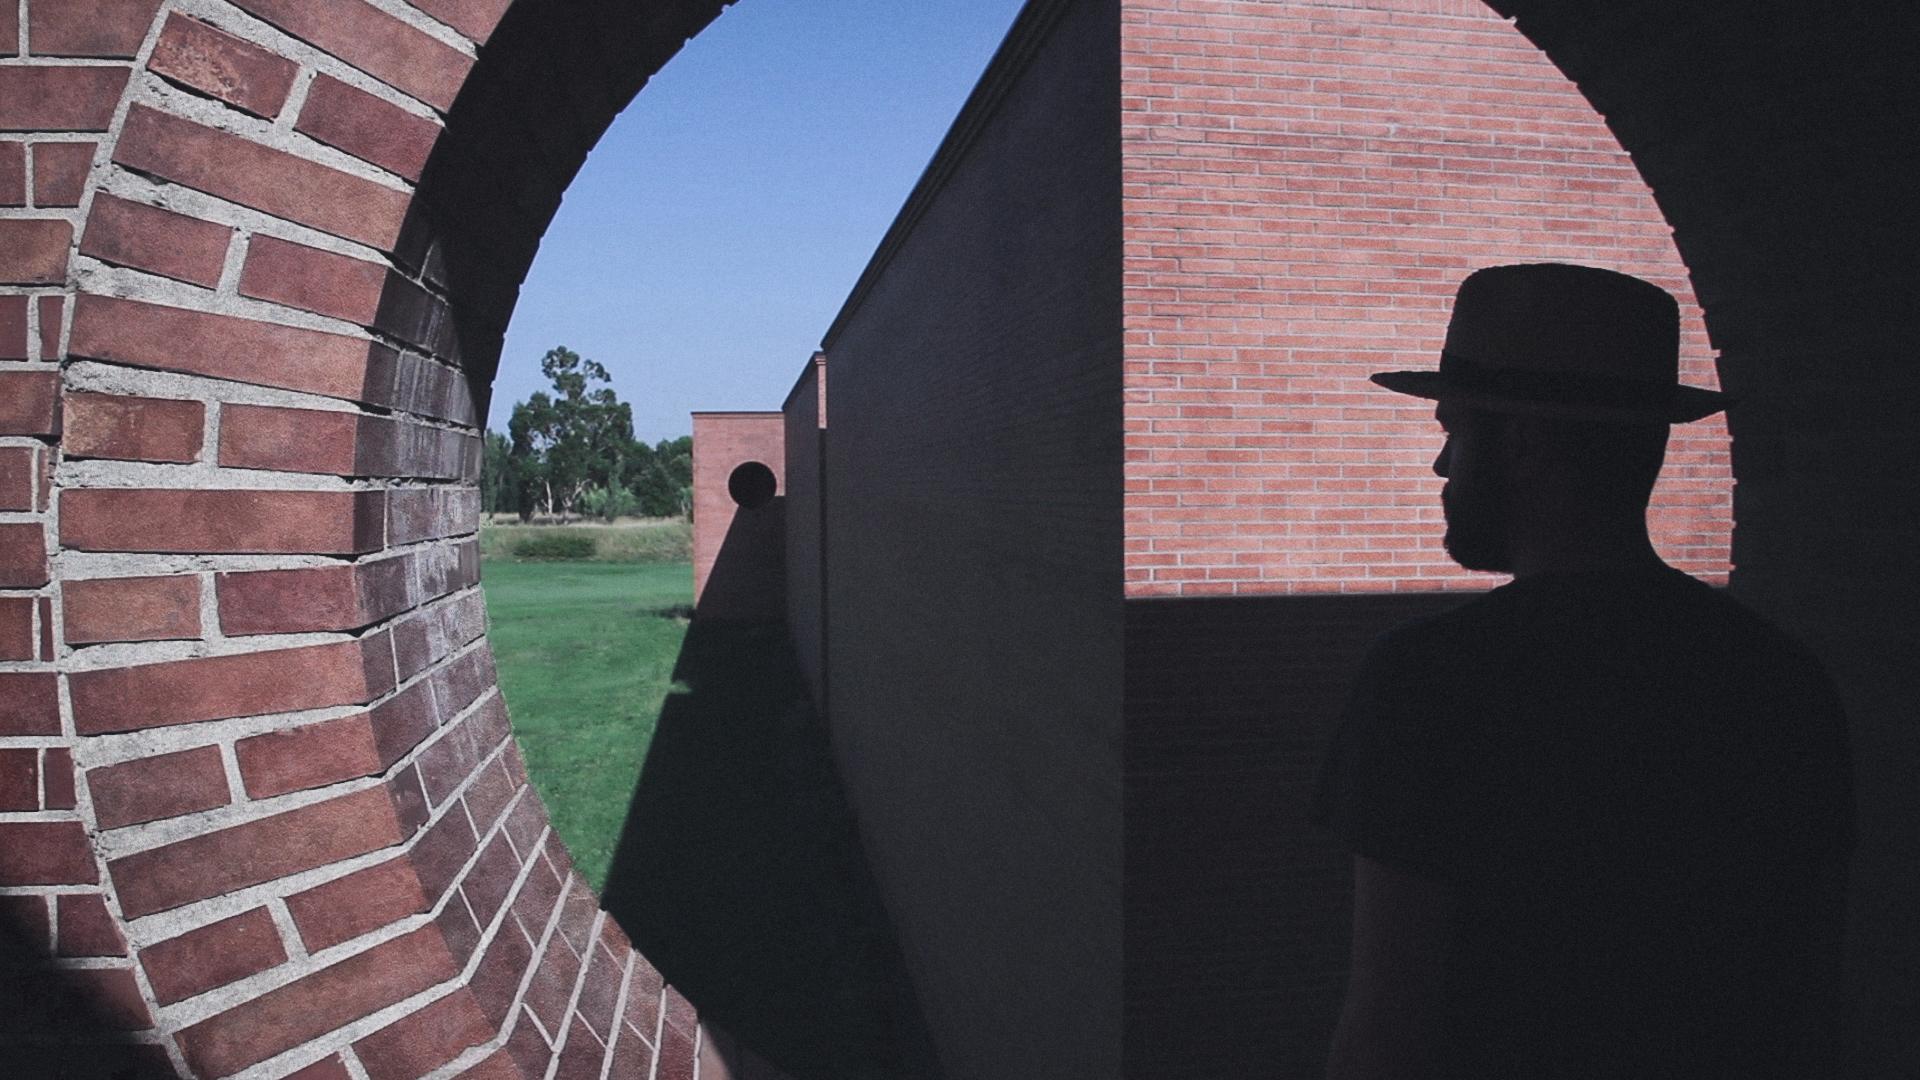 Light and shadowplay